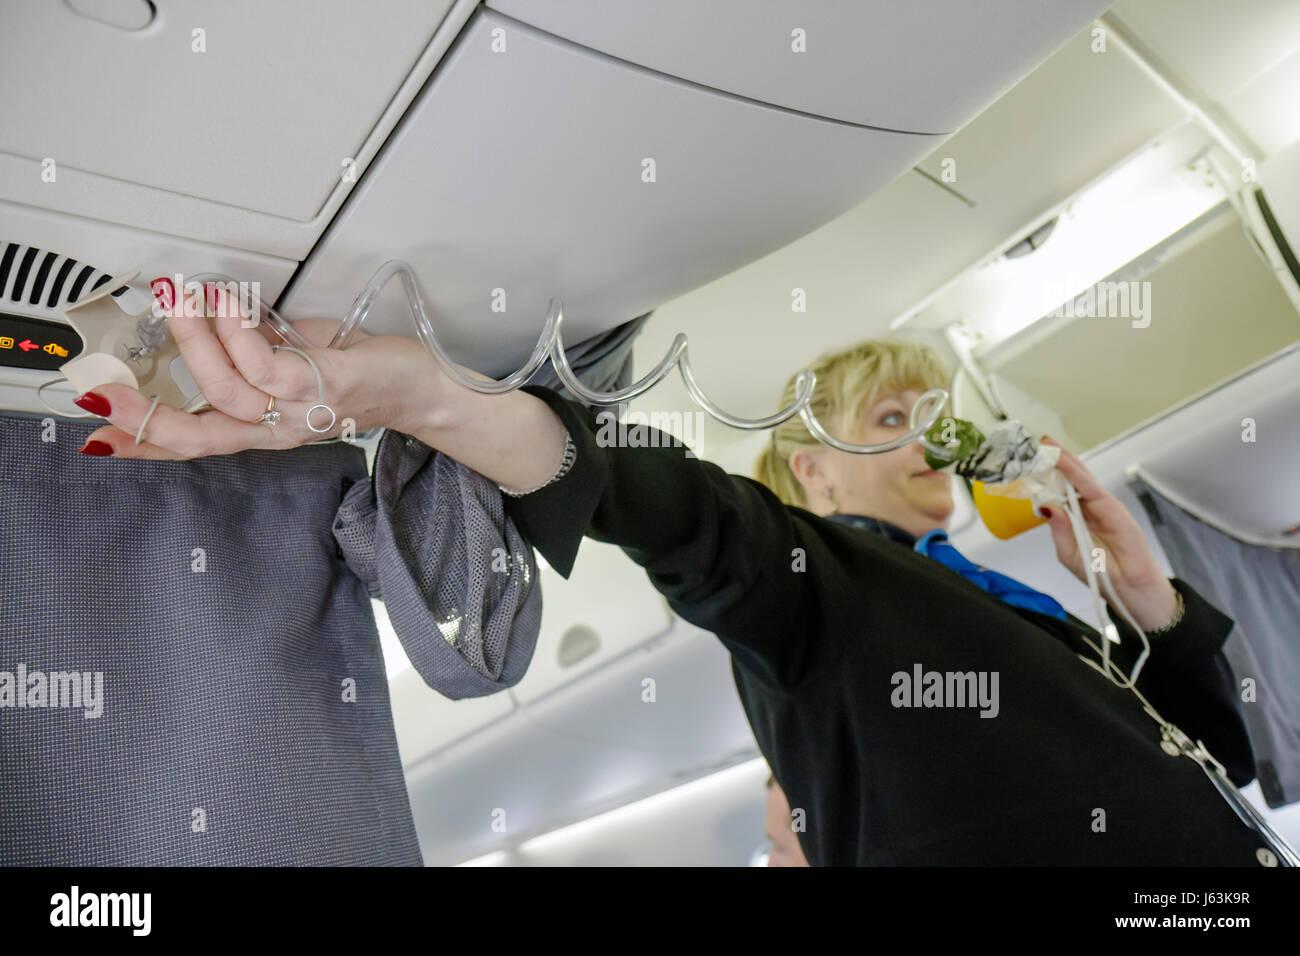 Michigan Detroit DTW Detroit Metropolitan Wayne County Airport Northwest Airlines safety instructions departure - Stock Image